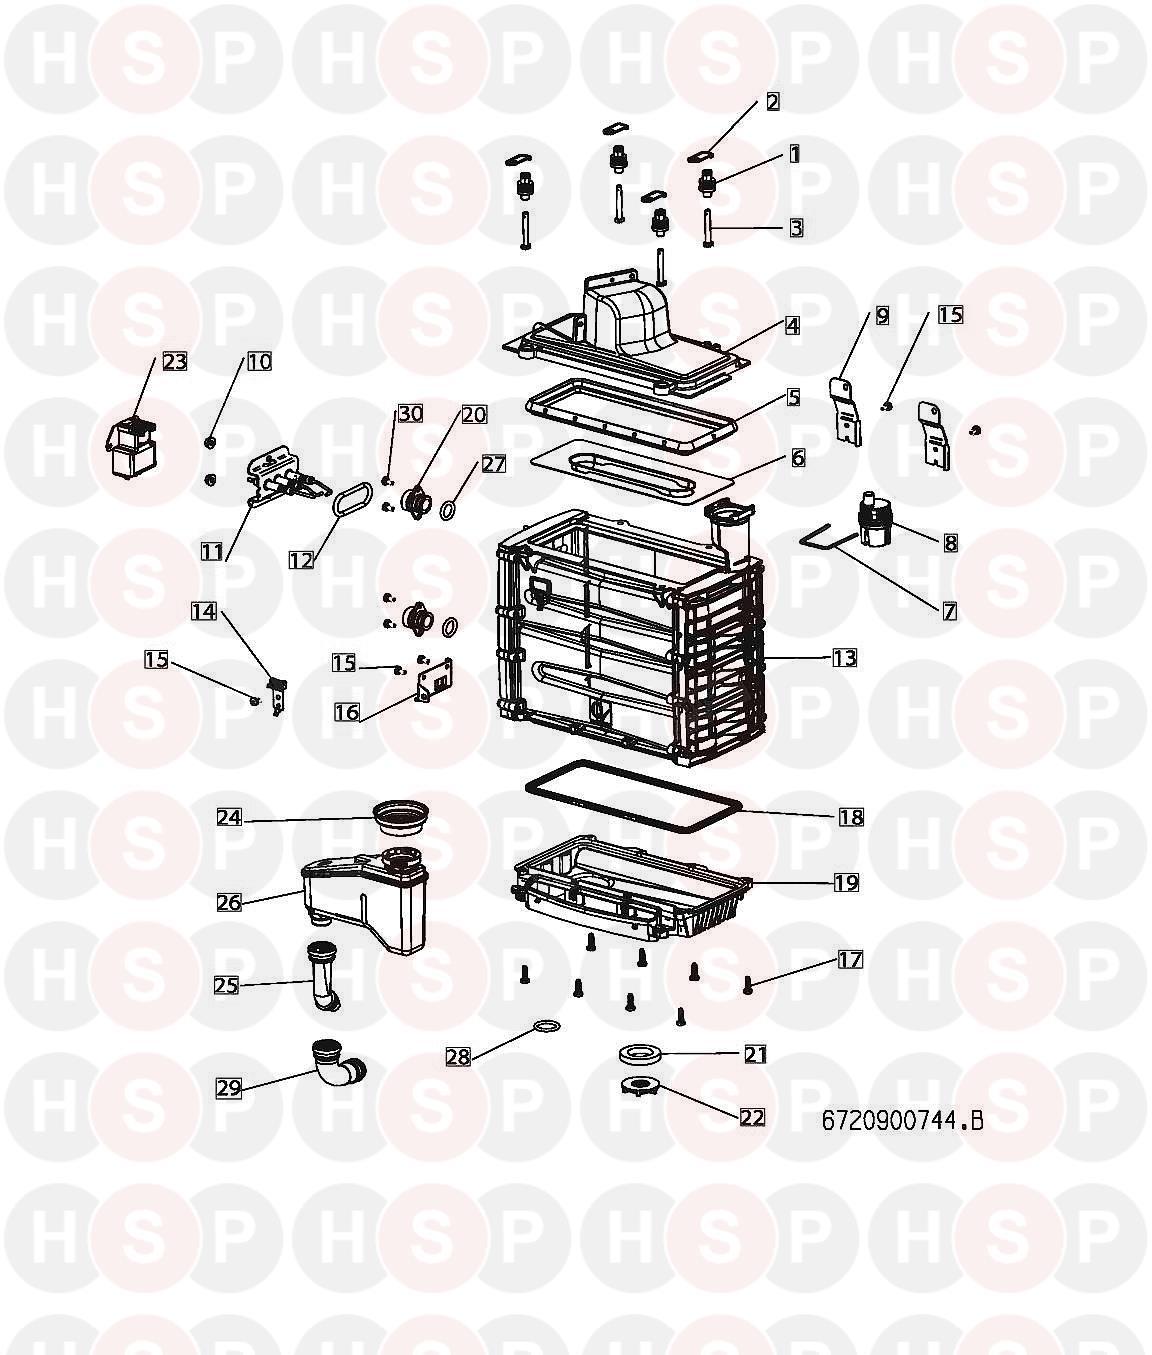 Worcester GREENSTAR 533 COMPACT Appliance Diagram (BURNER